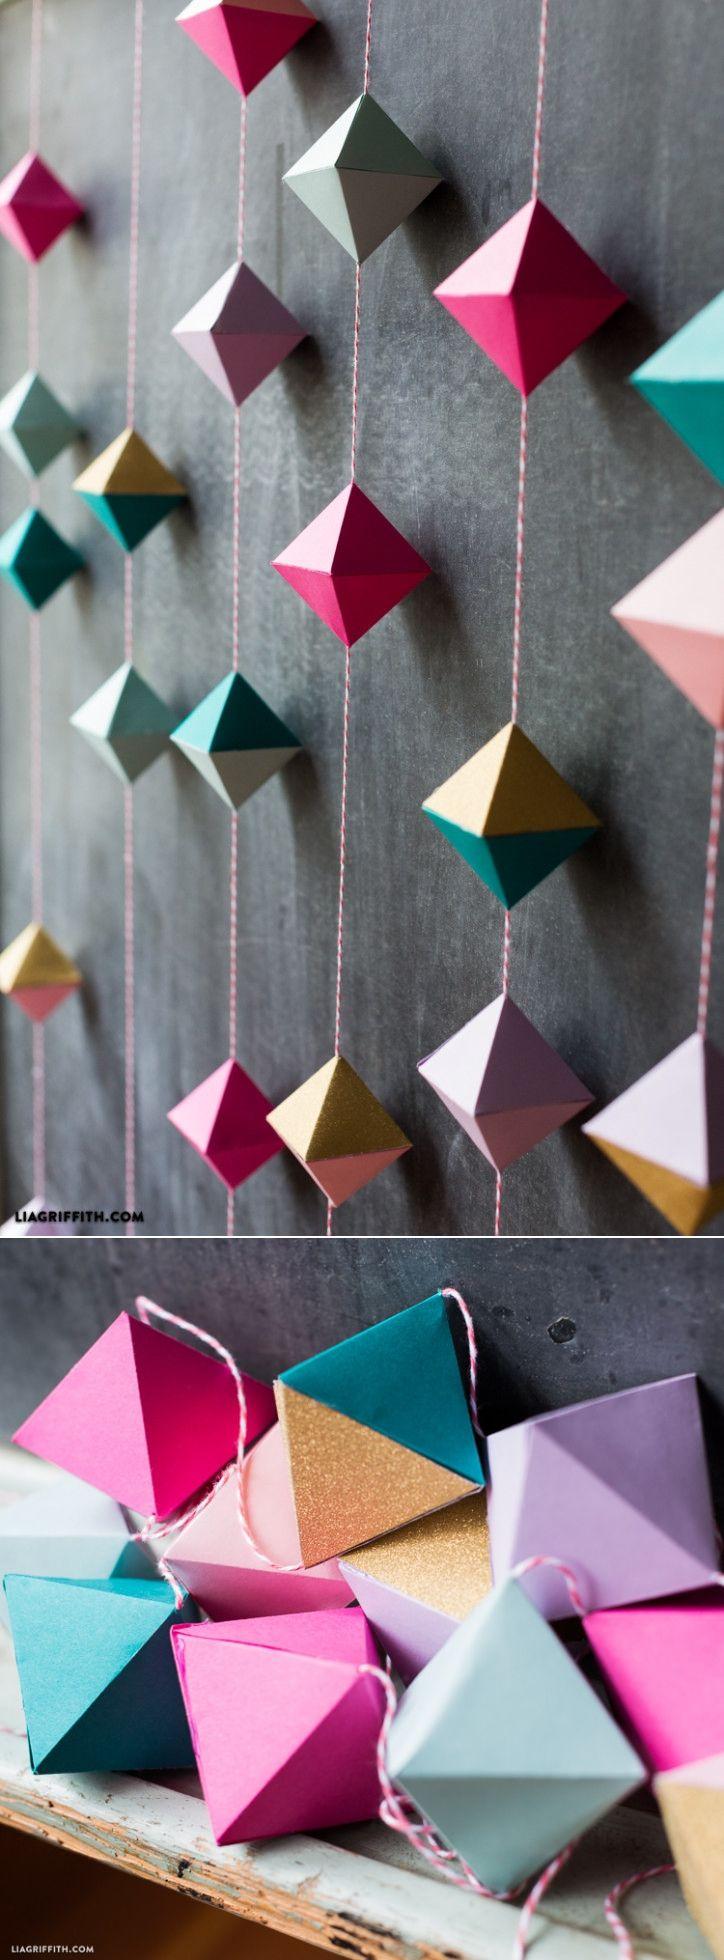 Diy paper geode garland beautiful paper crafts diy for Paper decorations diy